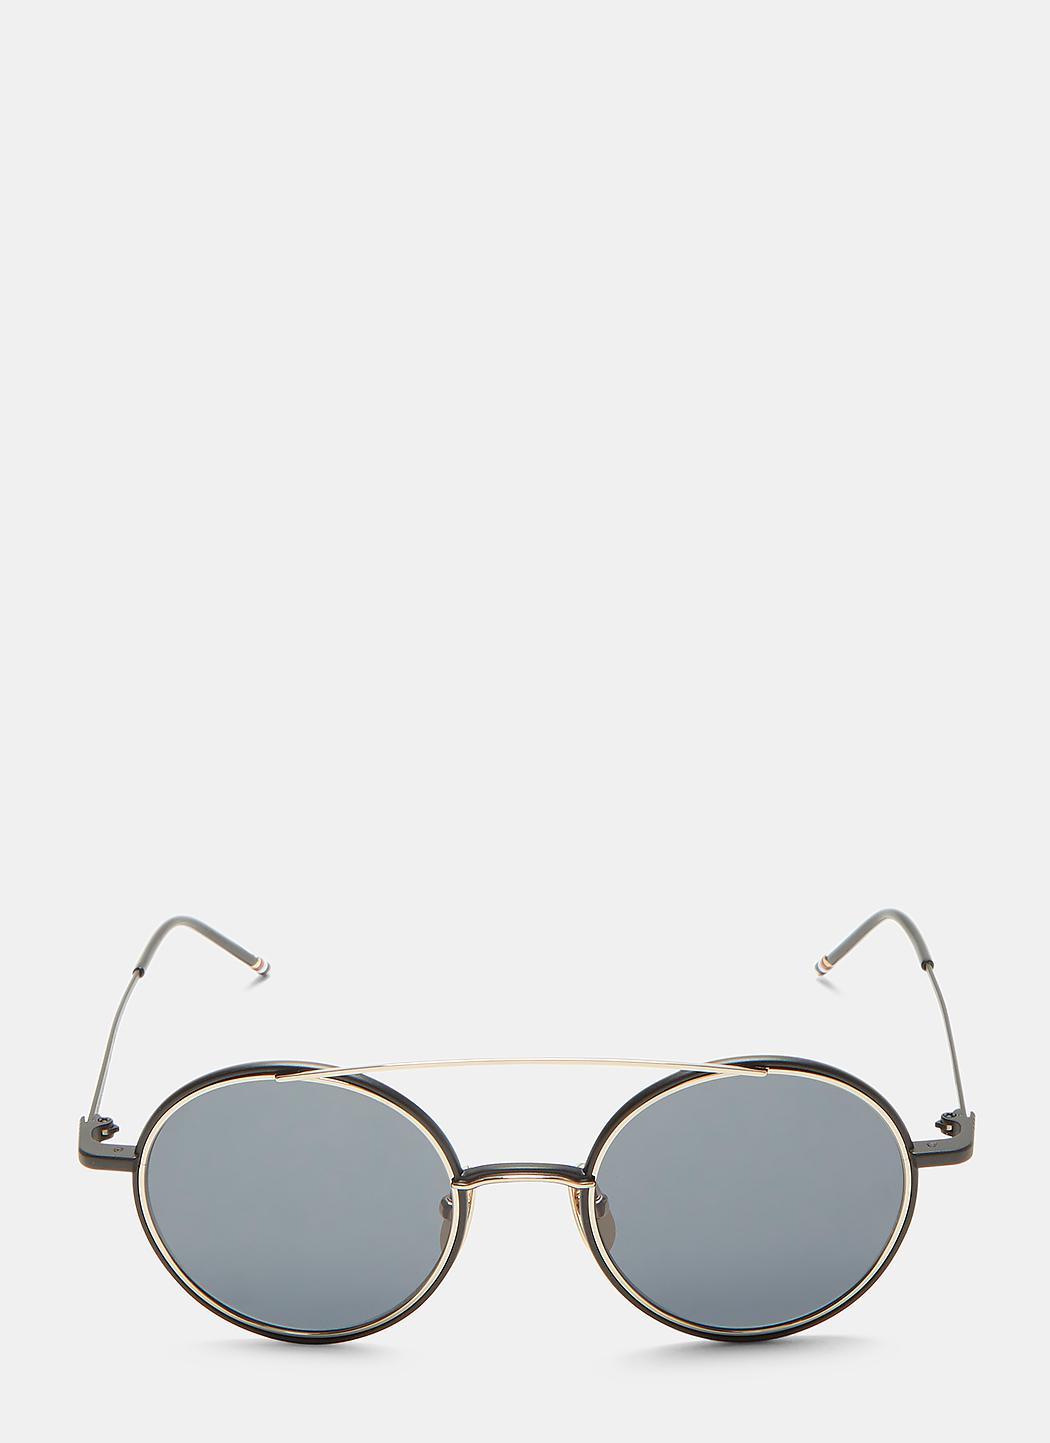 32f8e0fc7 Thom Browne Bridged Gold-rimmed Matte Round Sunglasses In Black And ...